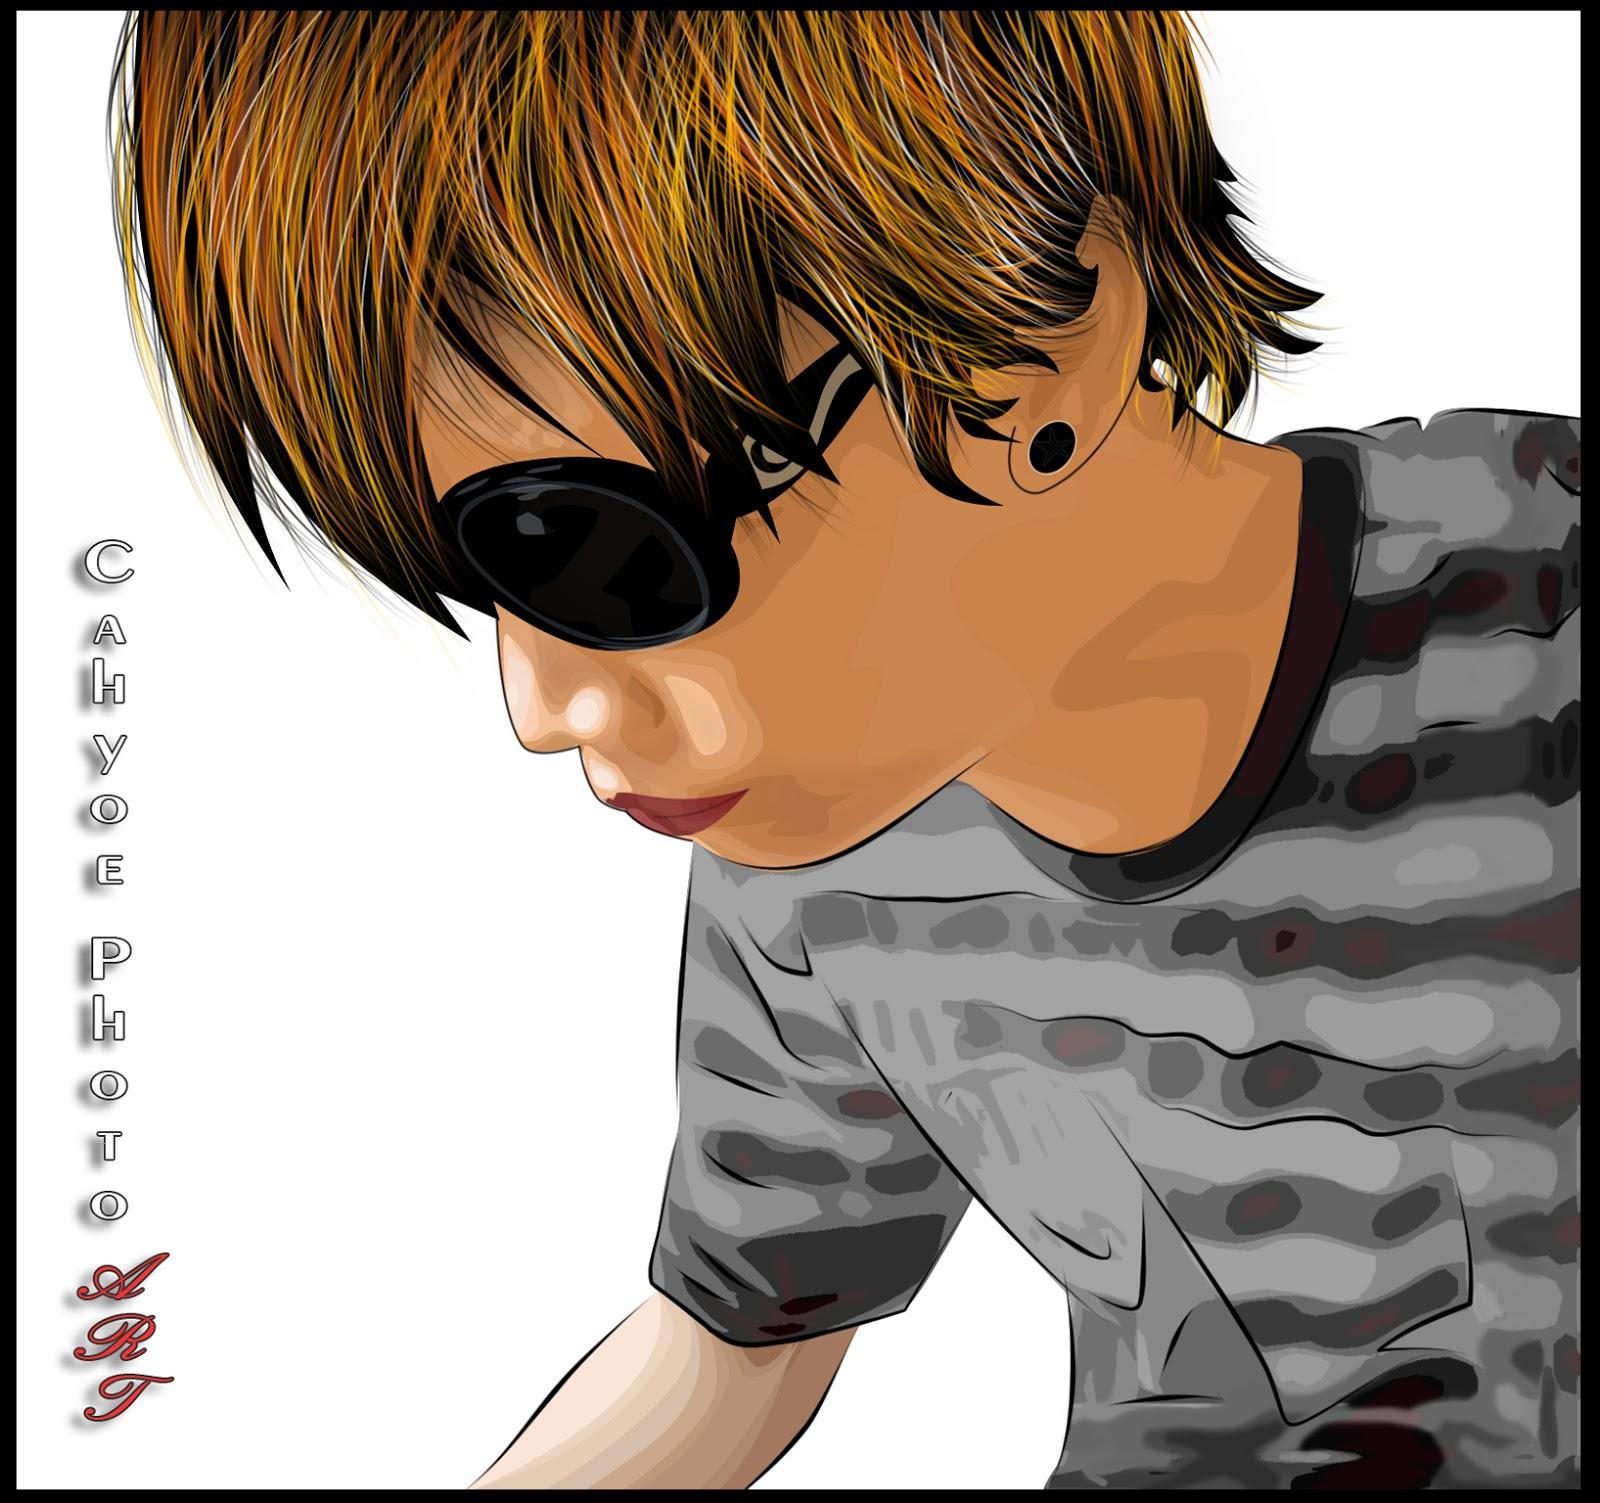 Cahyoe Blog Tutorial Vektor Vexel Pemula Photoshop Gambar Pria